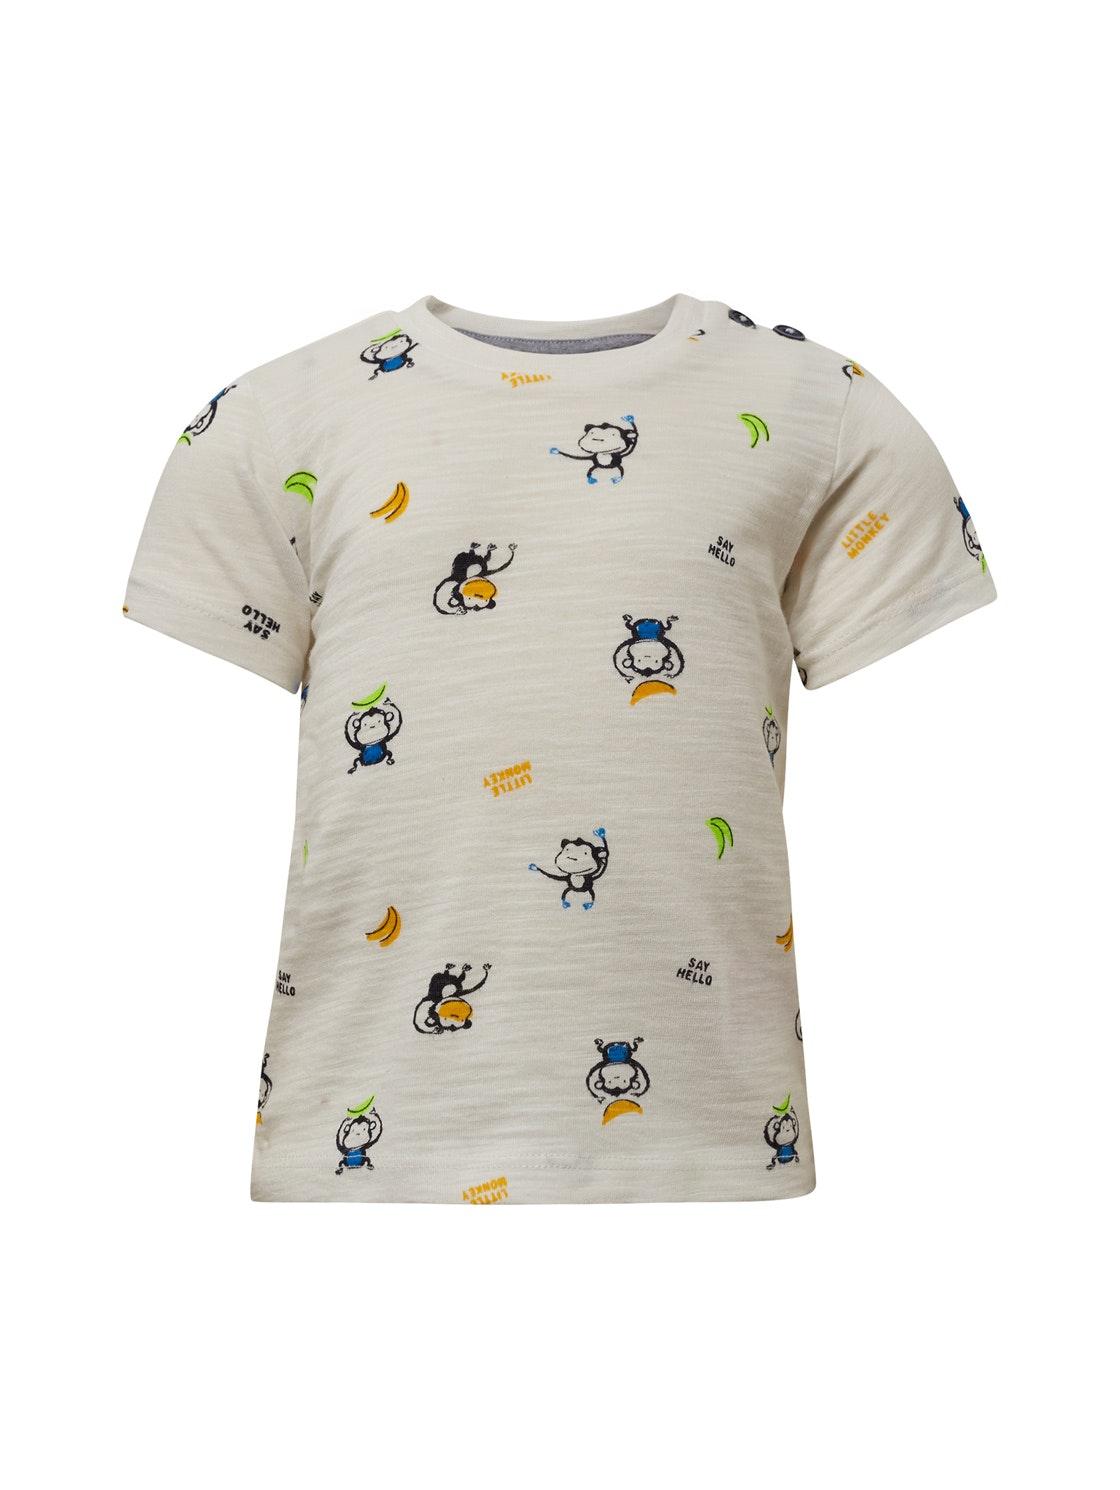 T-shirt patterned, bright white-white